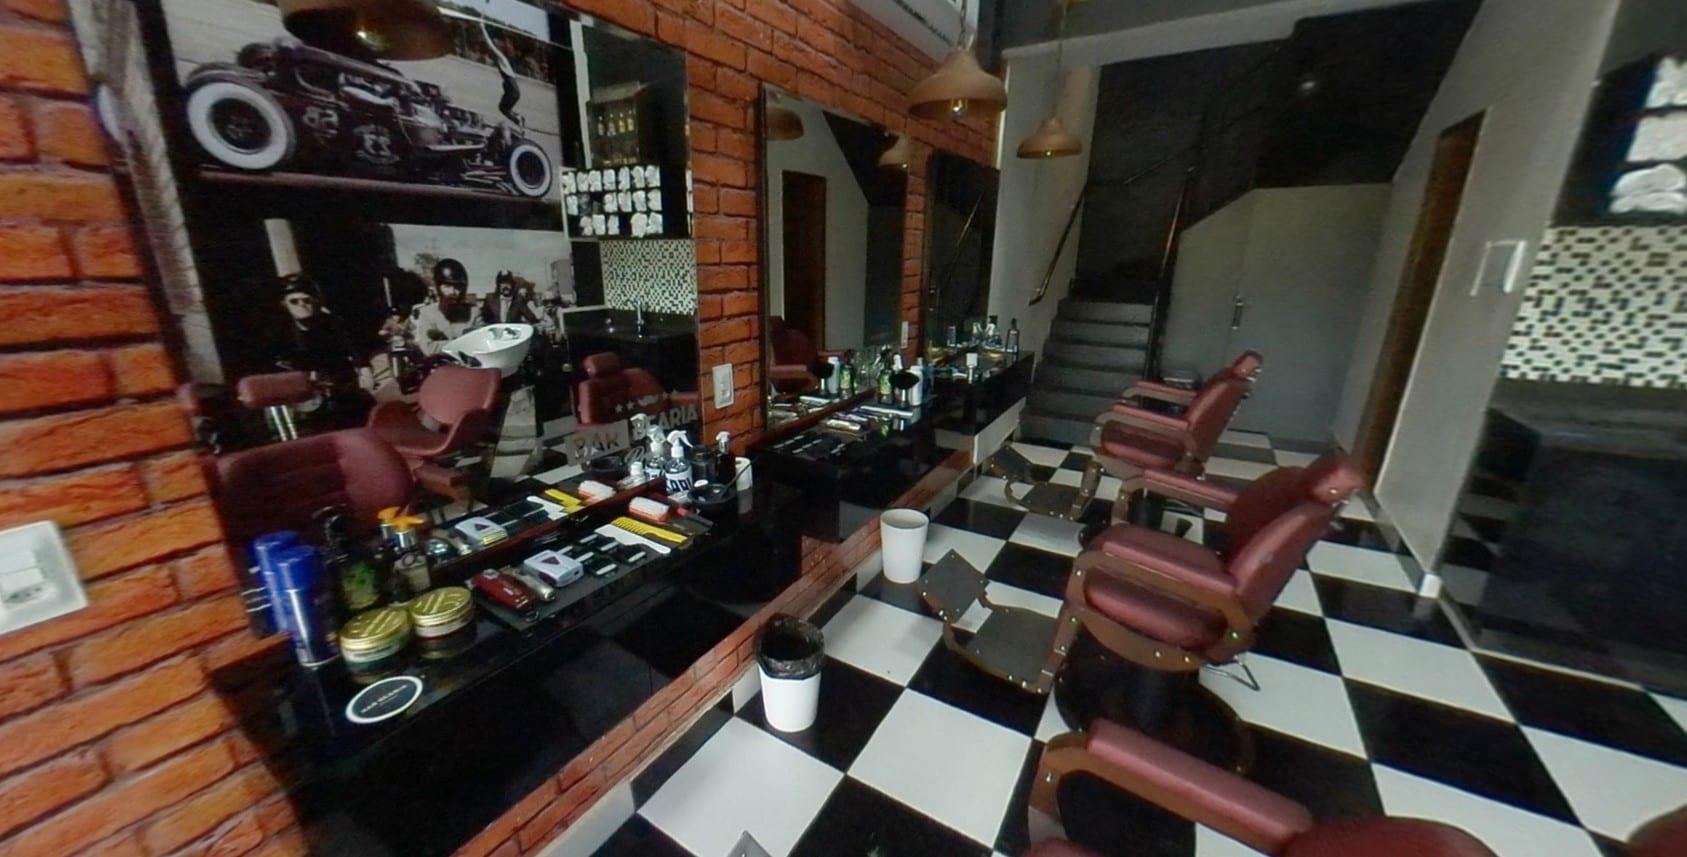 barbearia em Brasília